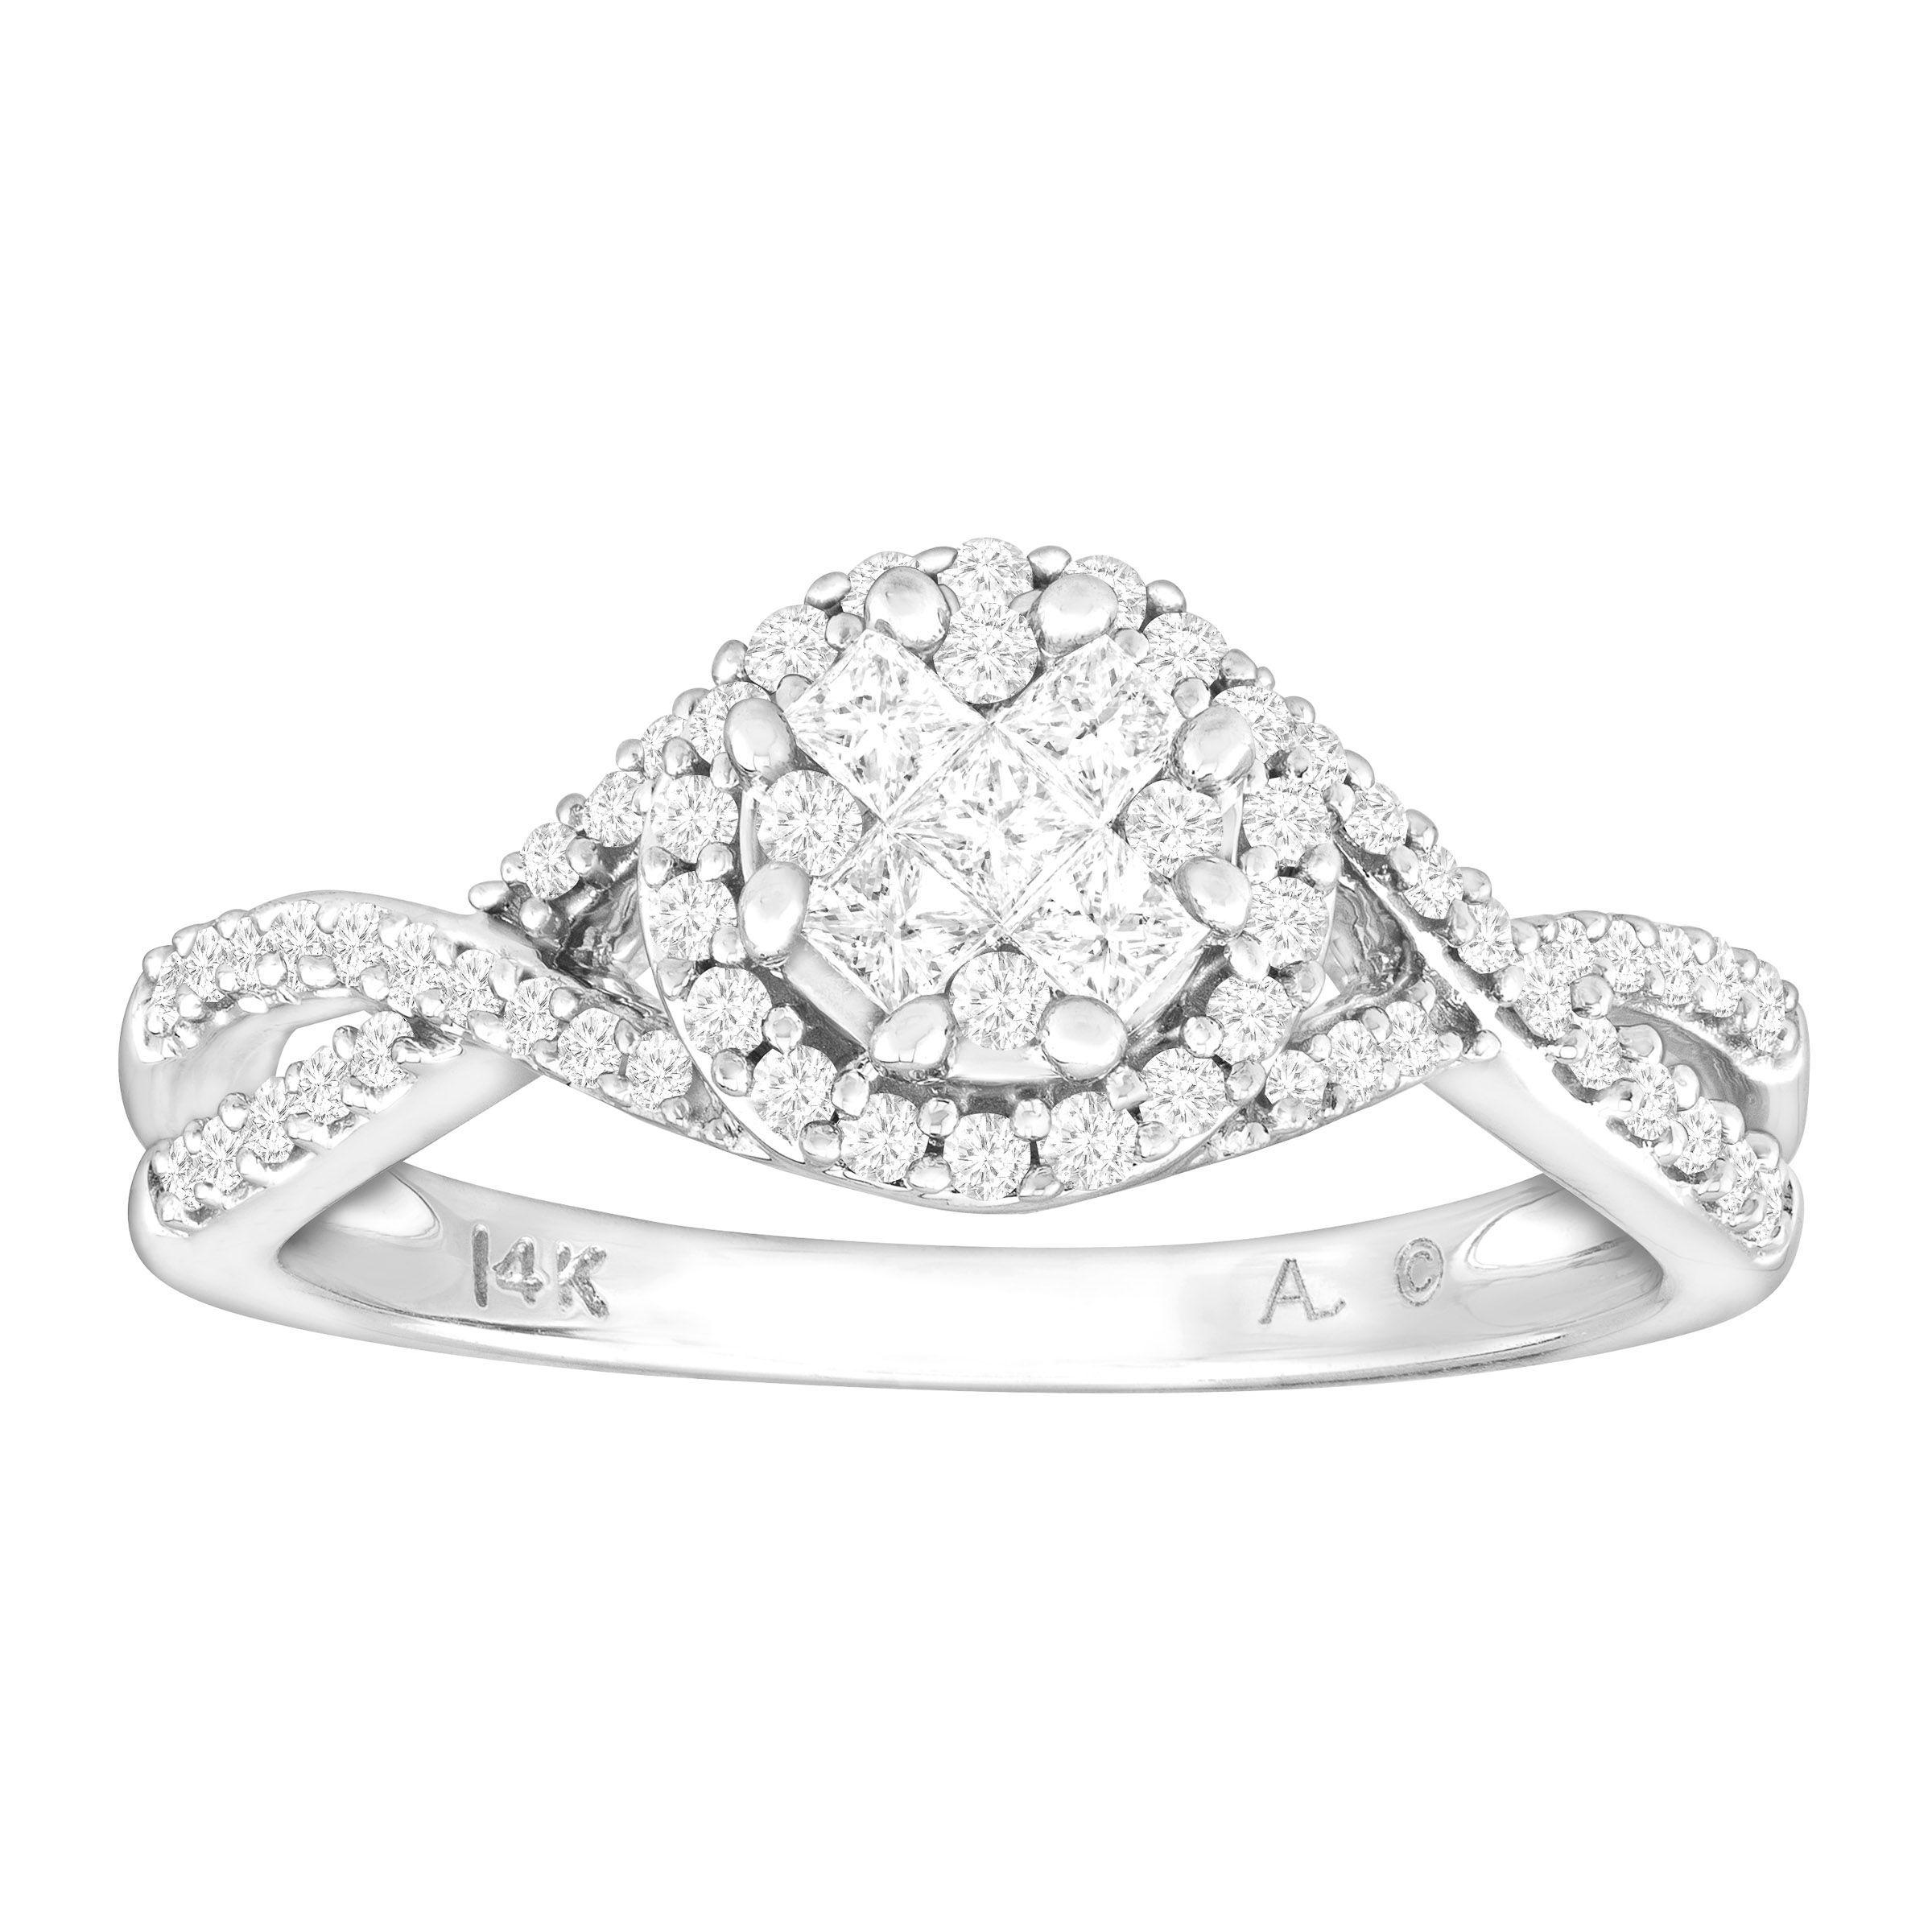 1 2 Ct Diamond Engagement Ring In 14k White Gold